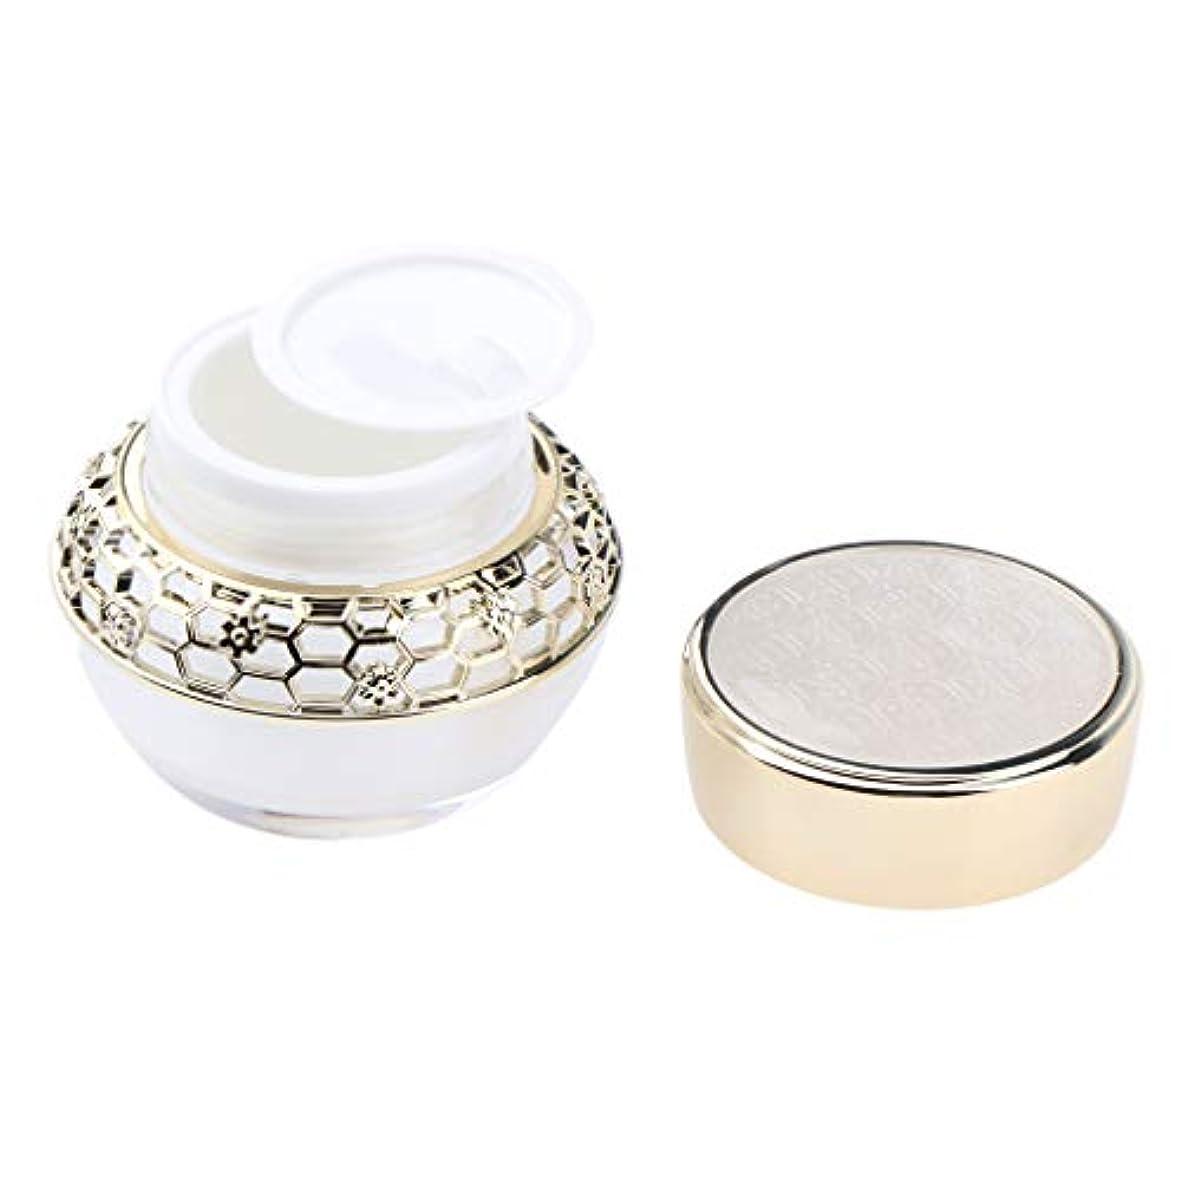 SM SunniMix クリーム 容器 クリームケース 化粧品 アクリル ローション 詰替え容器 2サイズ選べ - 50g